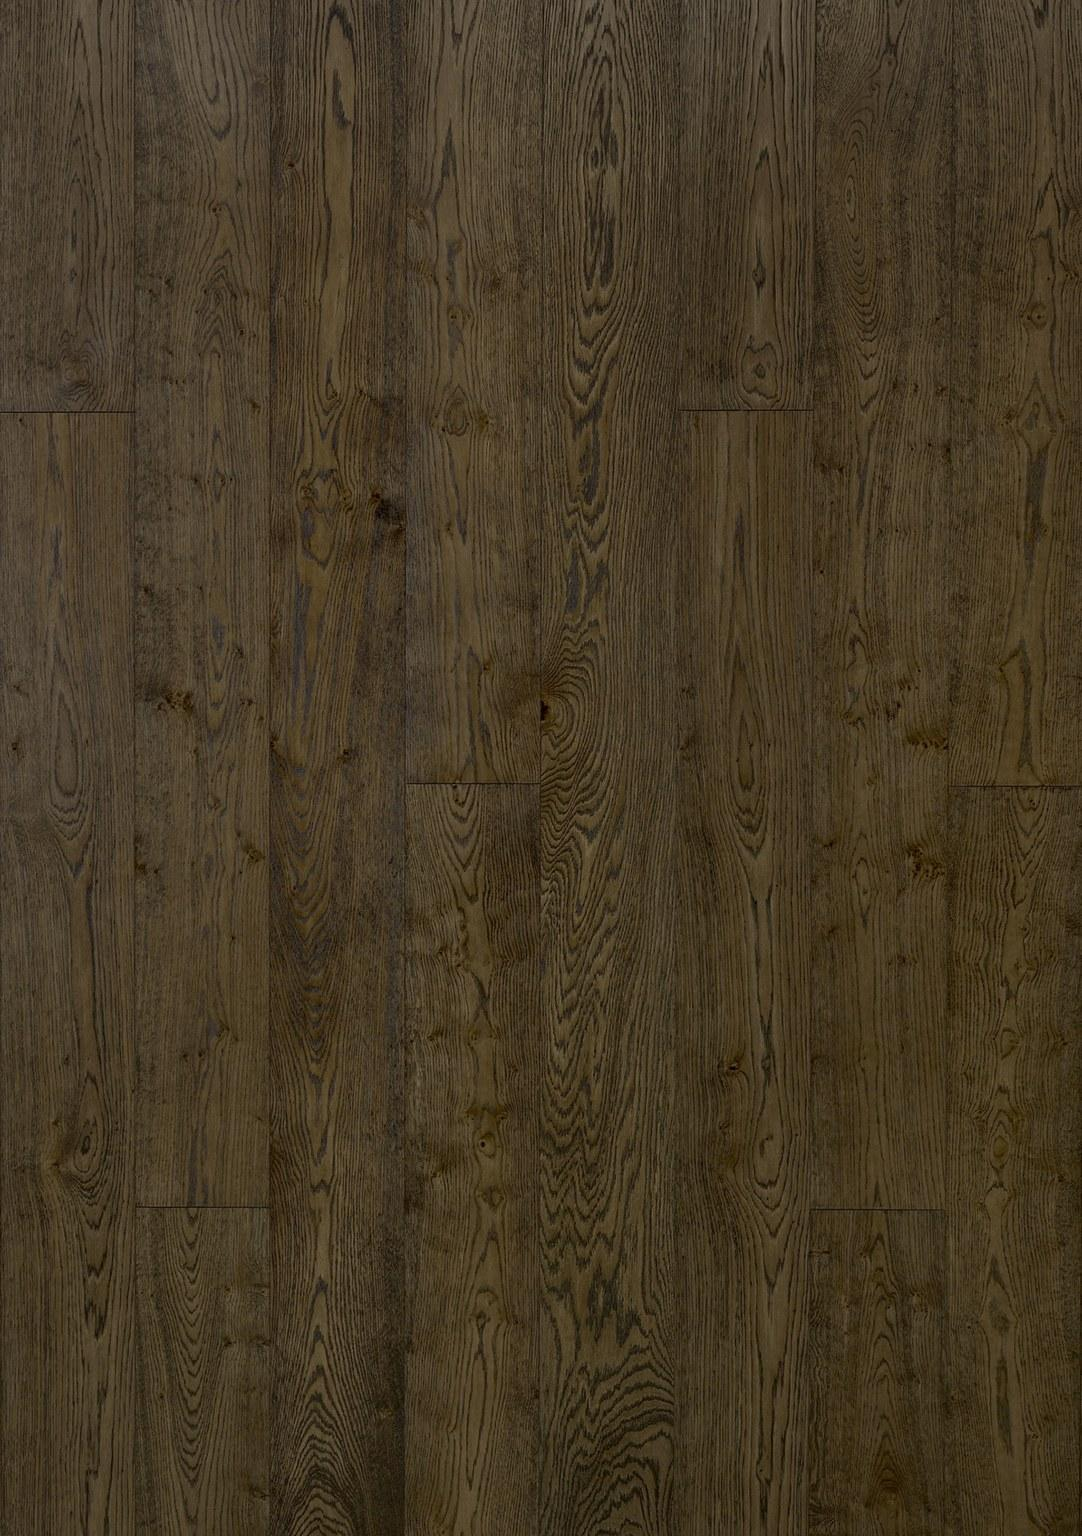 Timberwise Parketti Lankkuparketti Puulattia Wooden Floor Parquet Plank Tammi Oak Eben 2D1